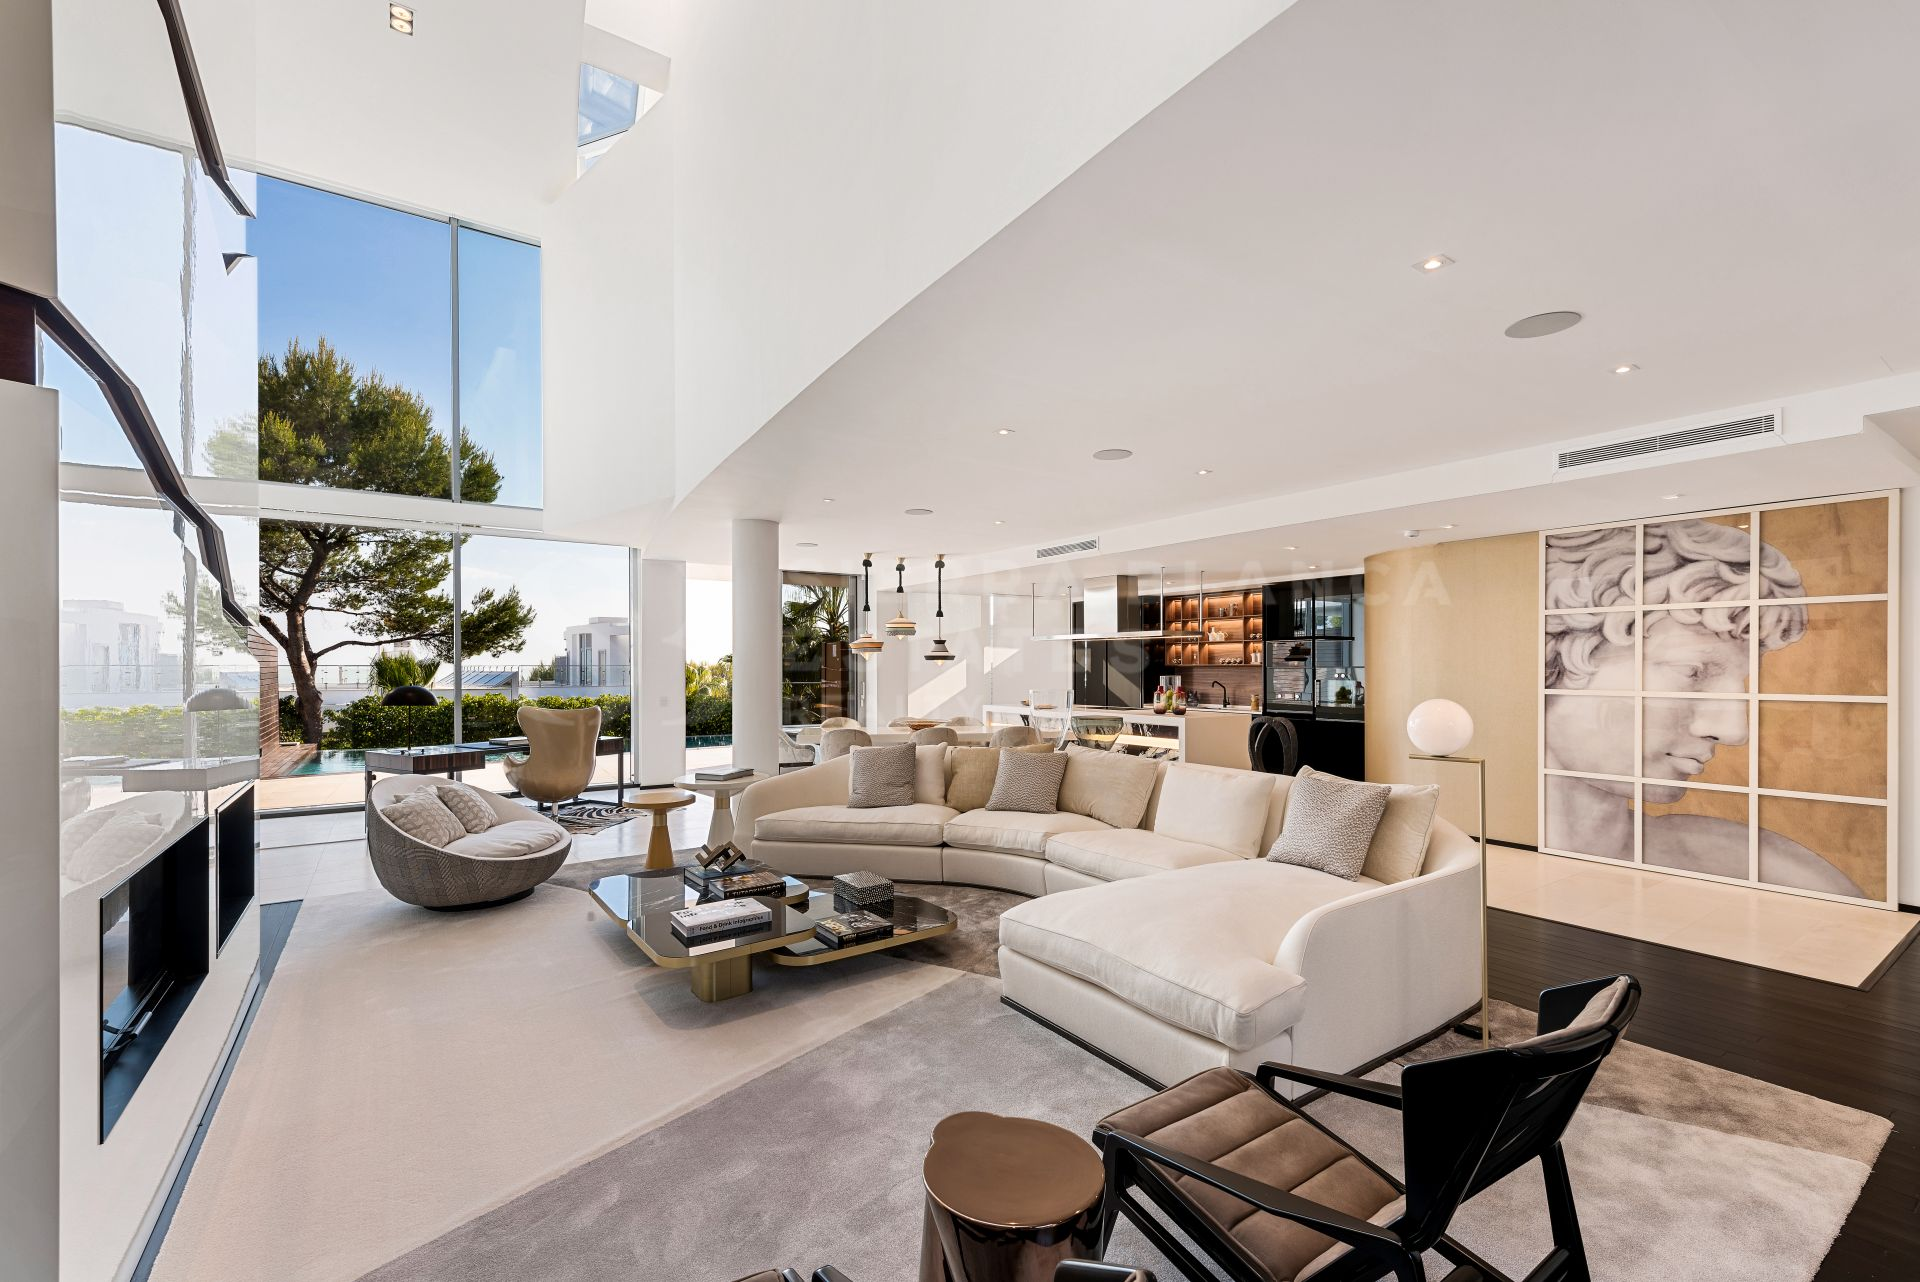 Design Villa in the Prestigious Sierra Blanca